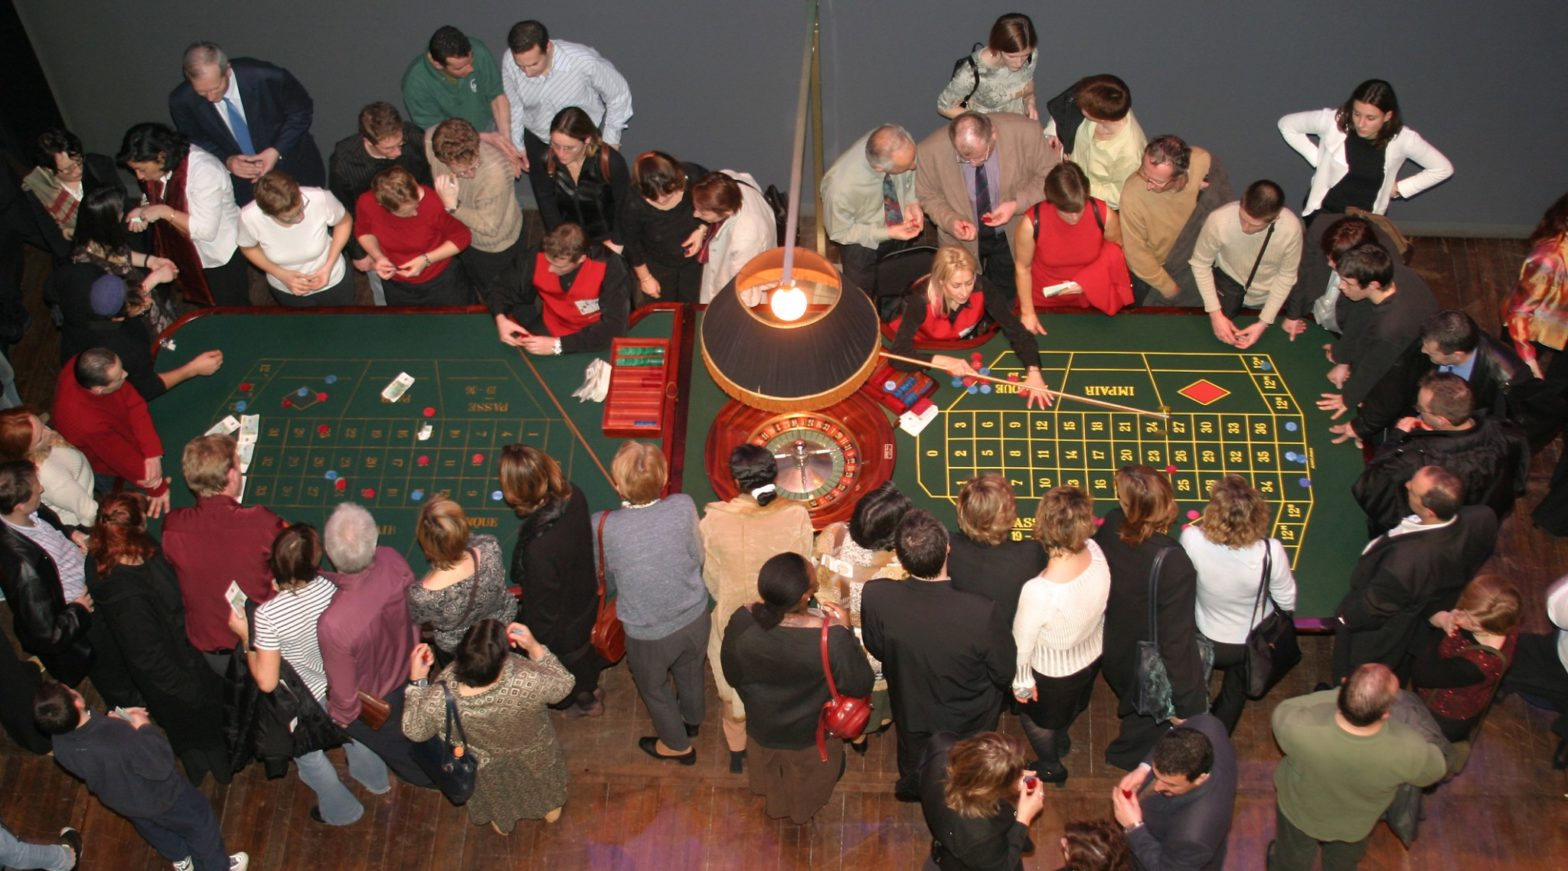 baccara casino gatineau 2019